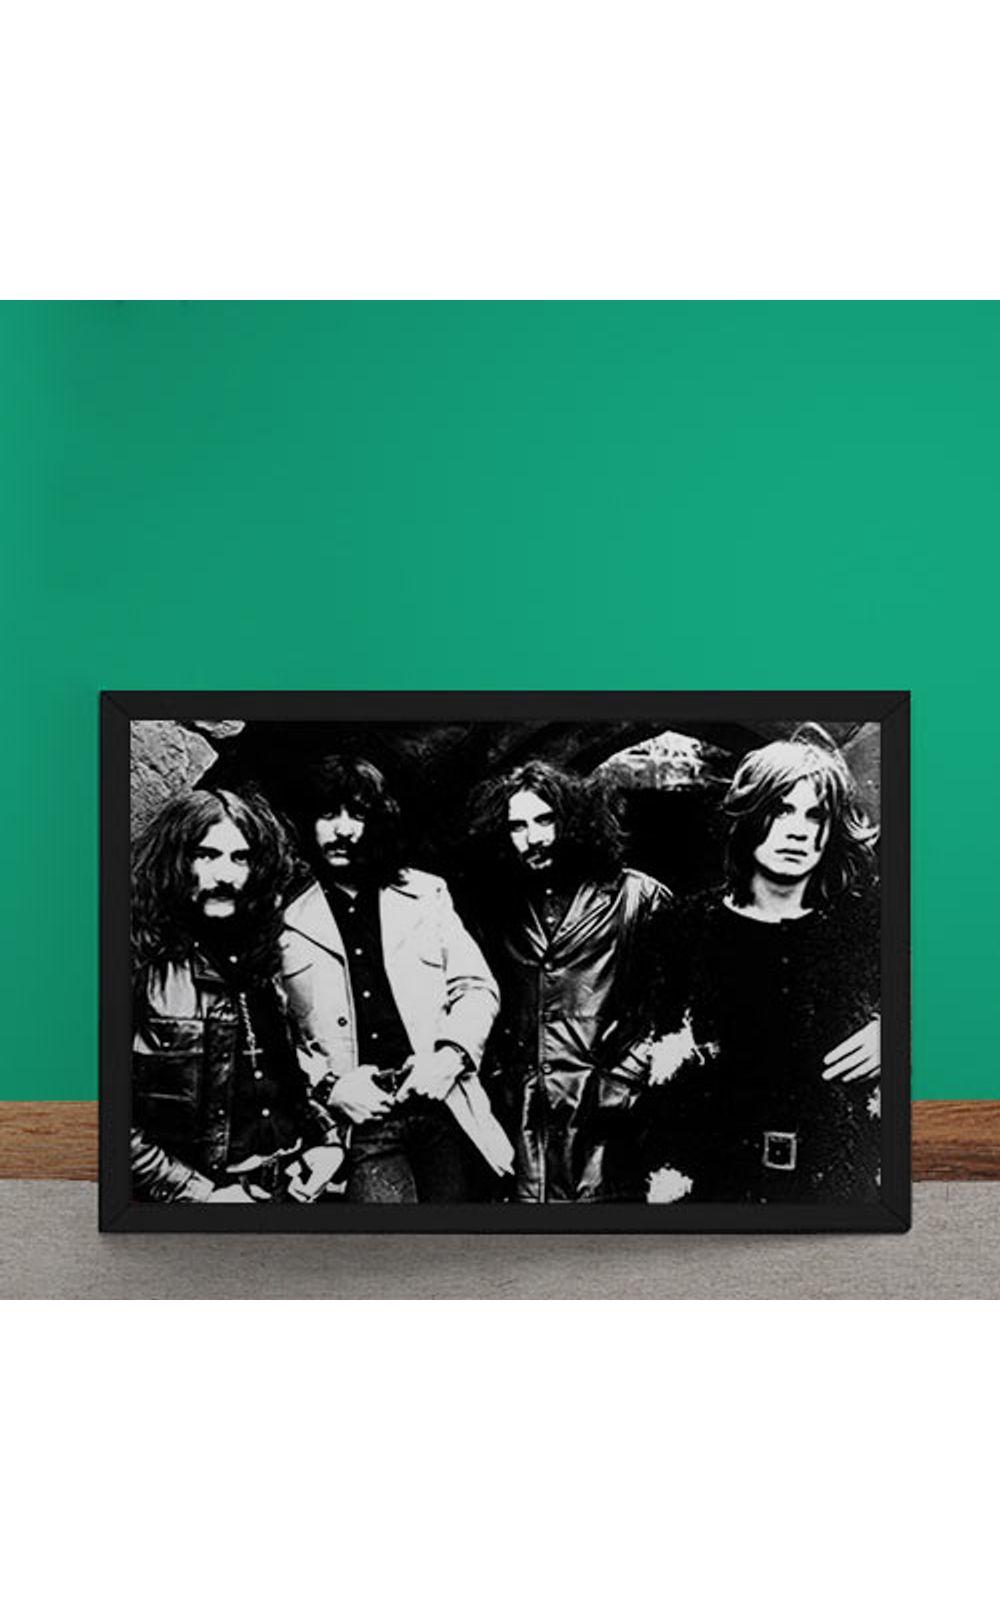 Foto 2 - Quadro Decorativo Black Sabbath Fotografia Antiga